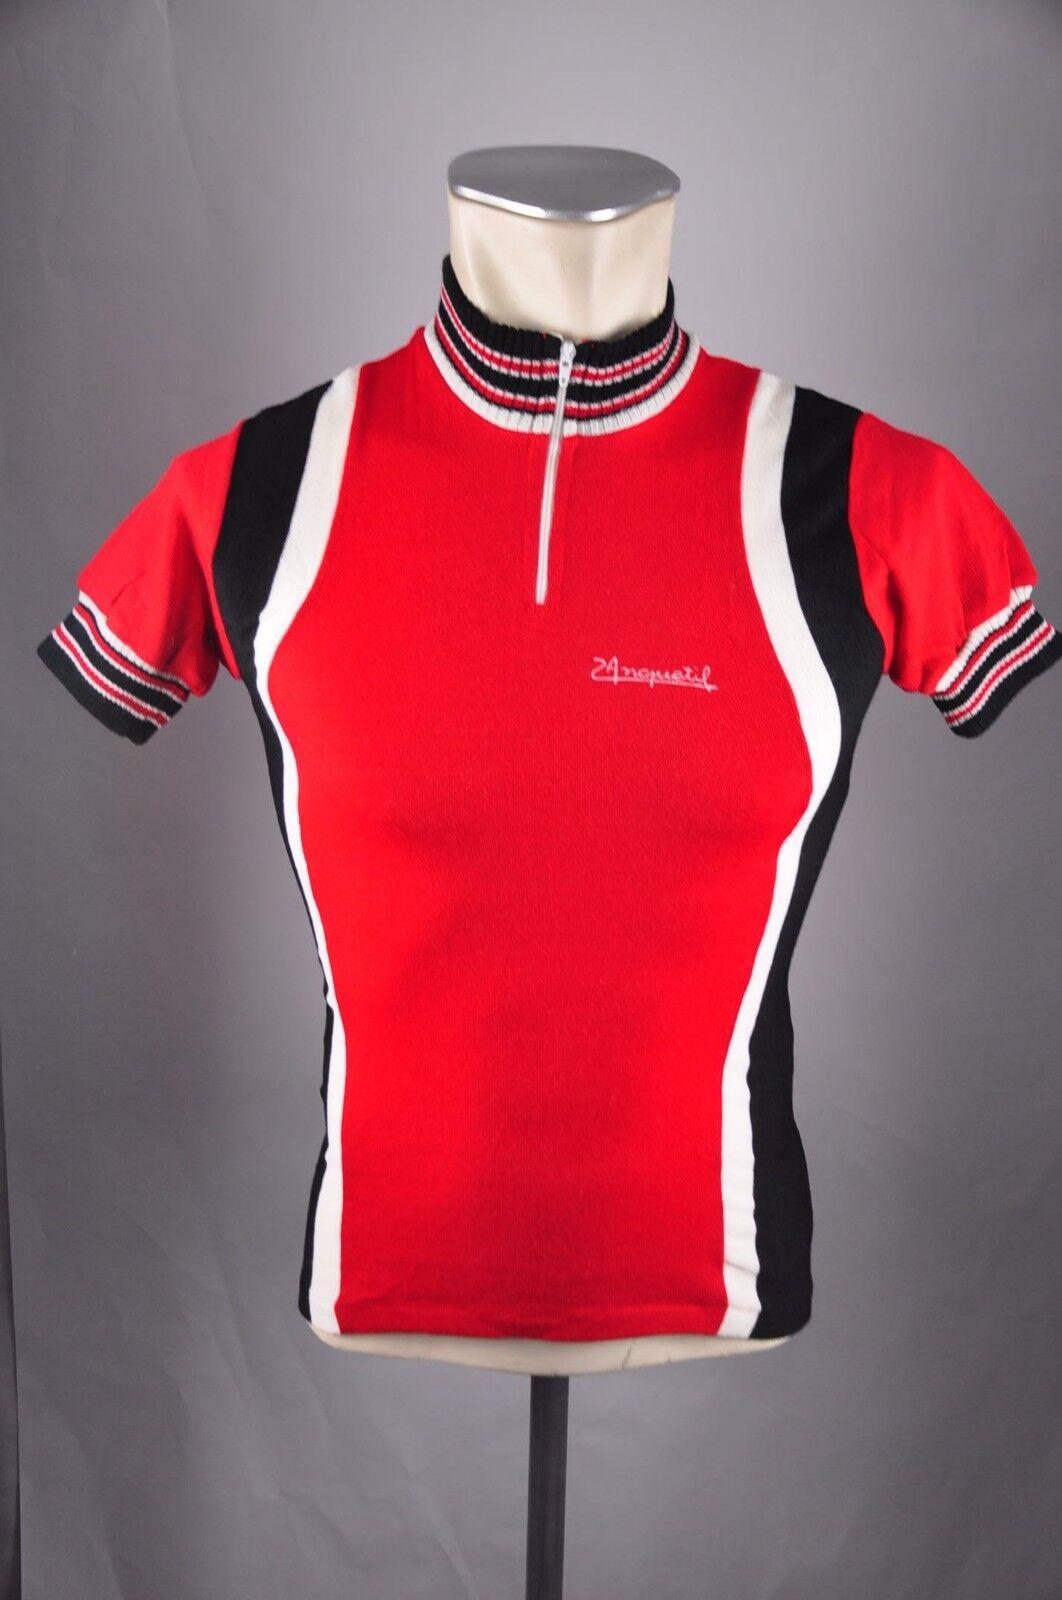 80er Rad Trikot Jersey Wolle Gr. XS BW 39cm Bike cycling wool Shirt WO2